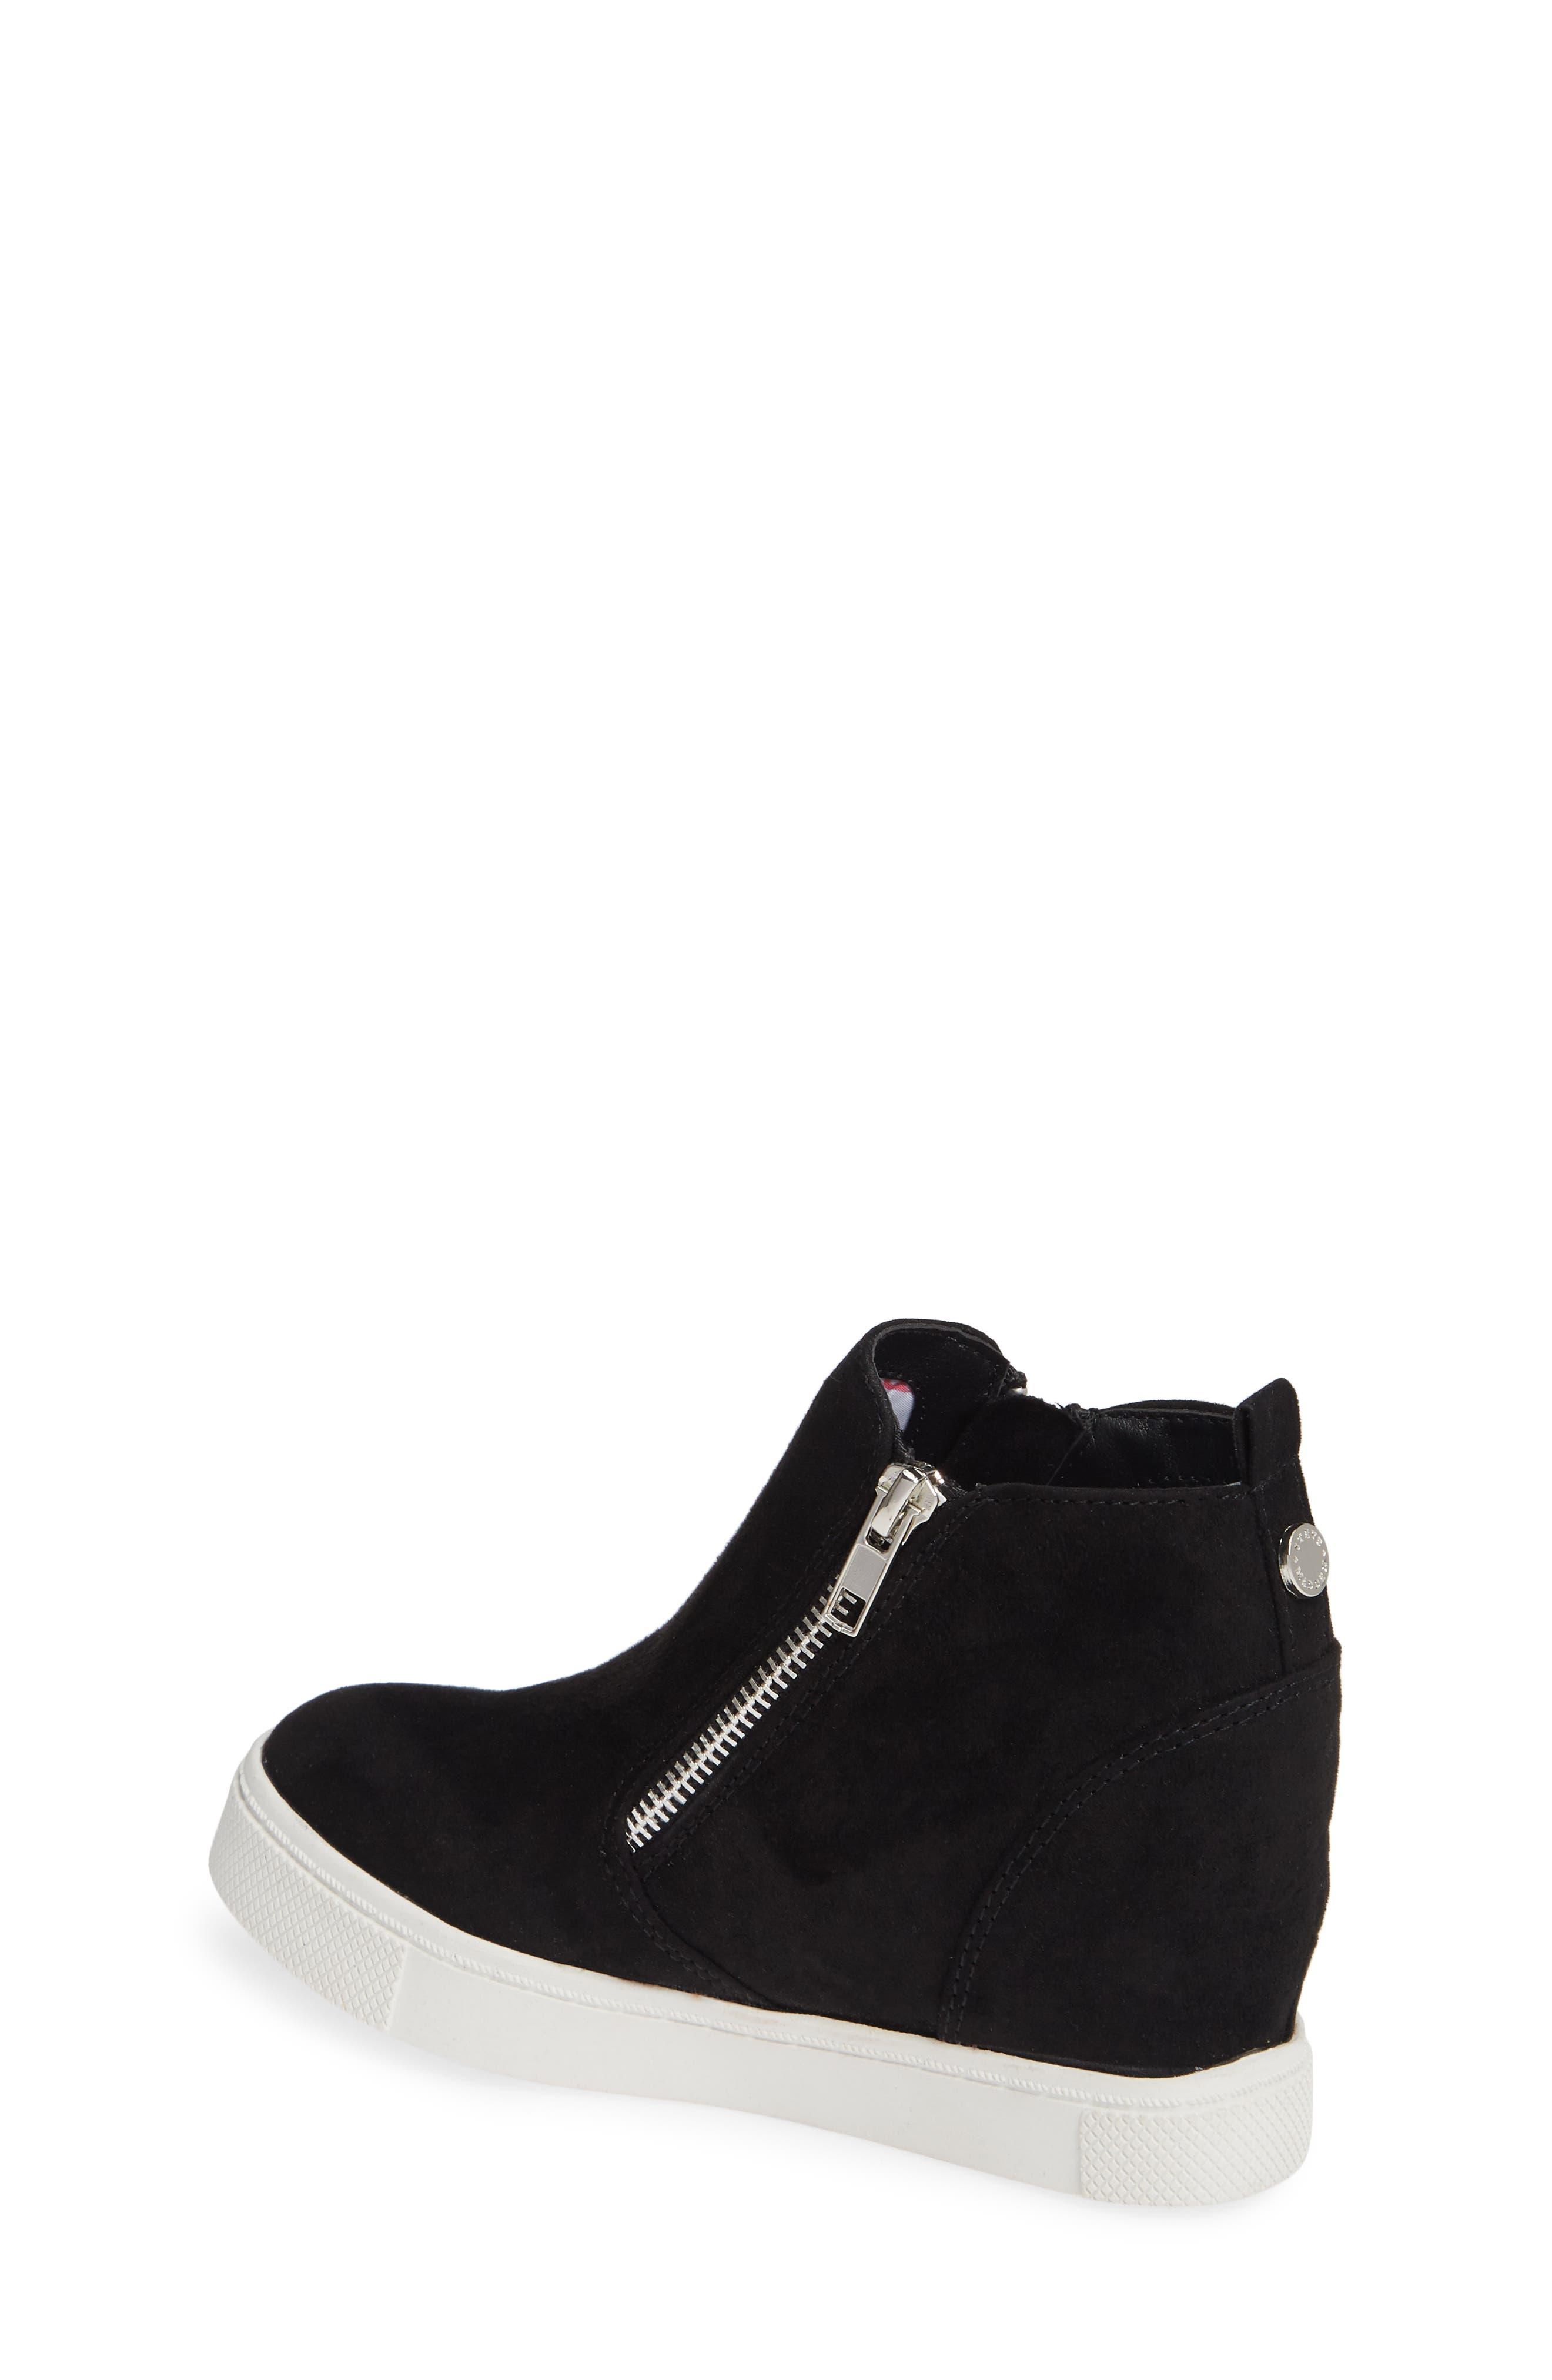 Wedgie Hidden Wedge Sneaker,                             Alternate thumbnail 2, color,                             BLACK